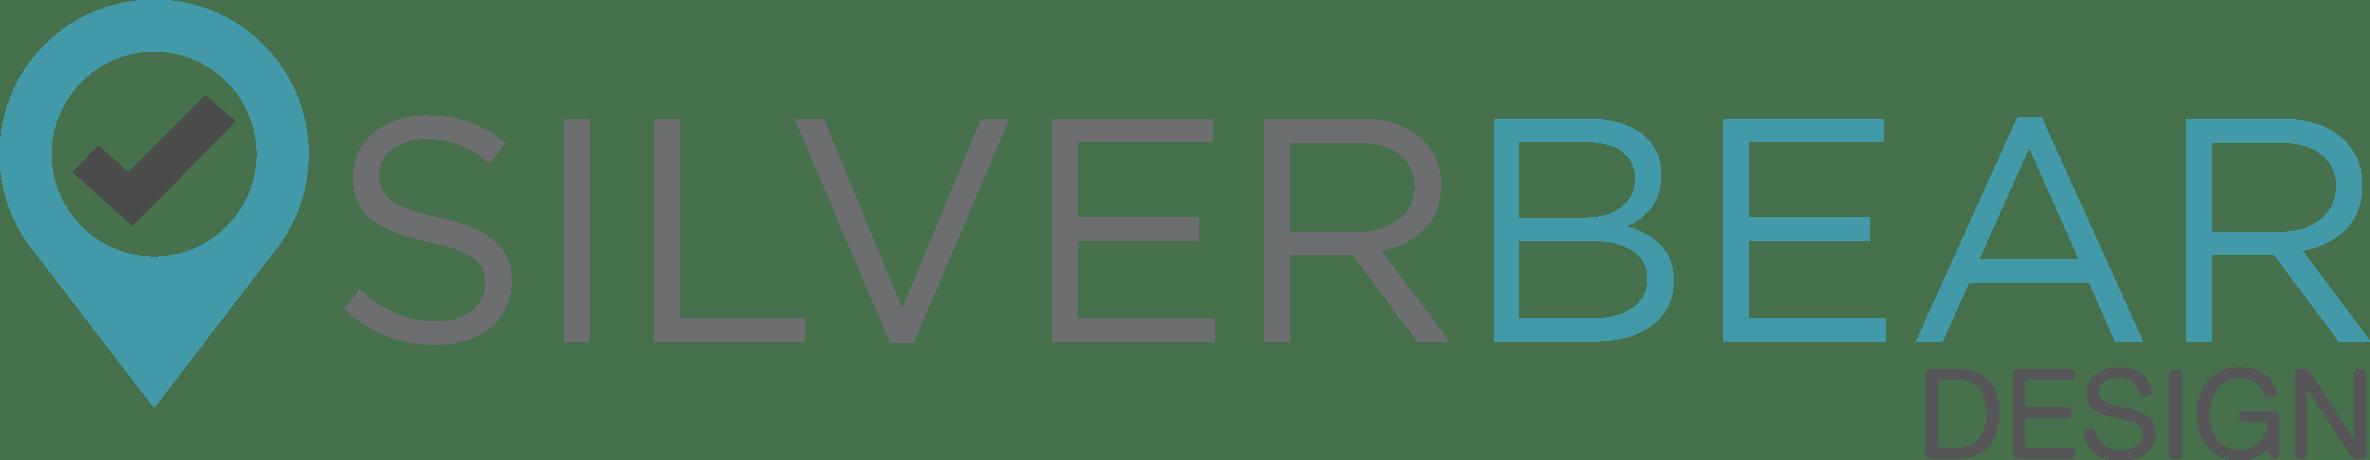 Silverbear Design